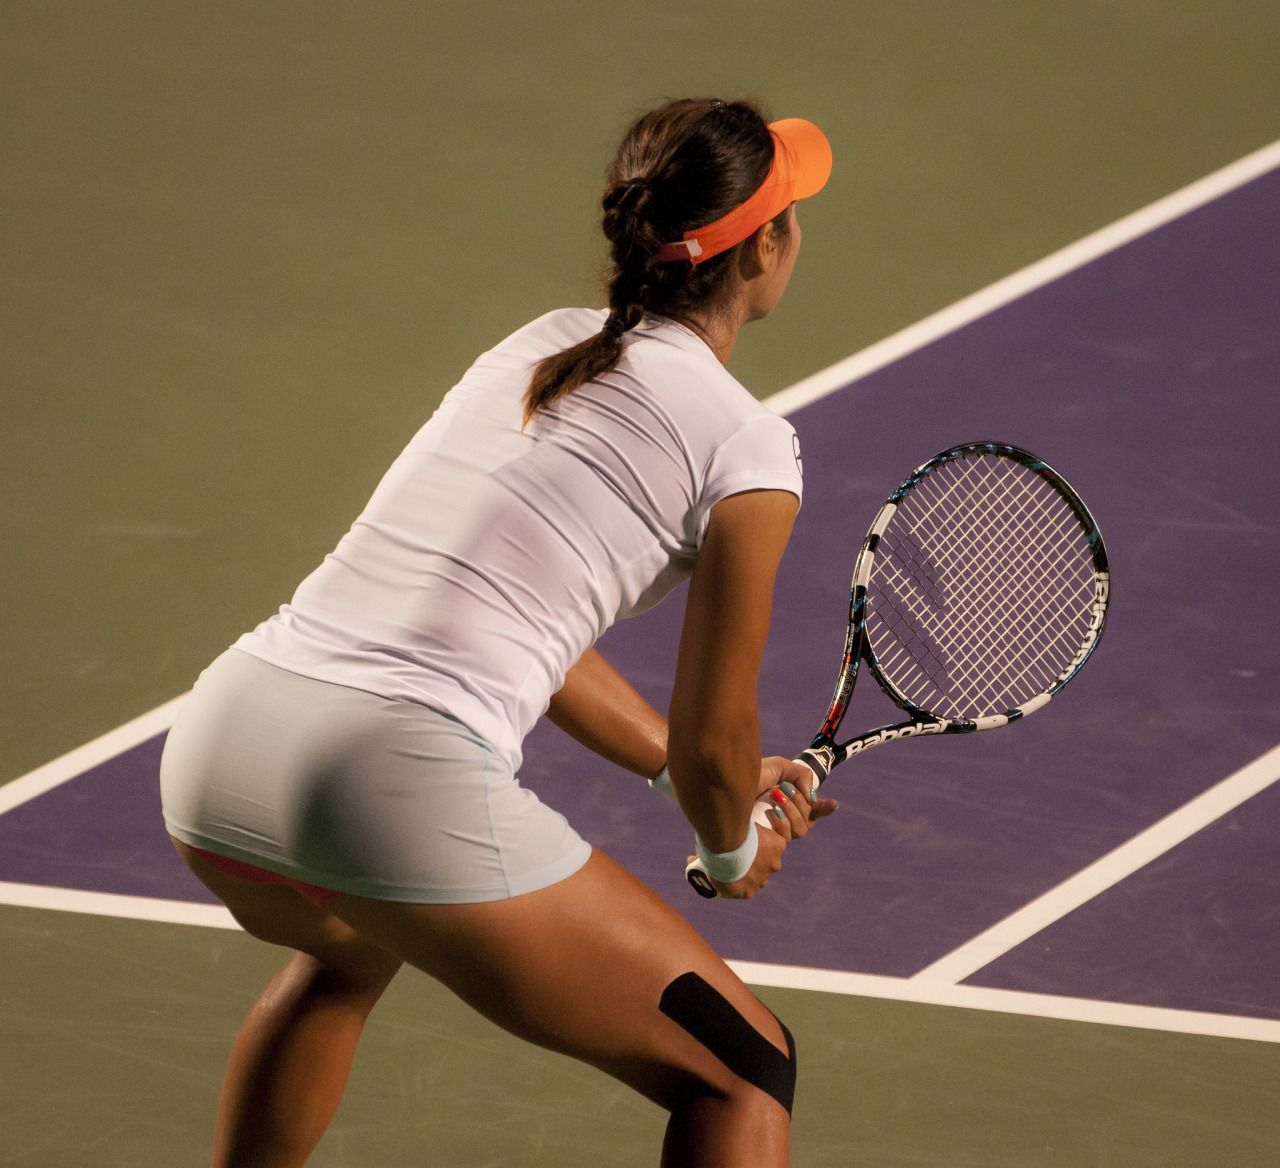 Tennis player taking huge cock